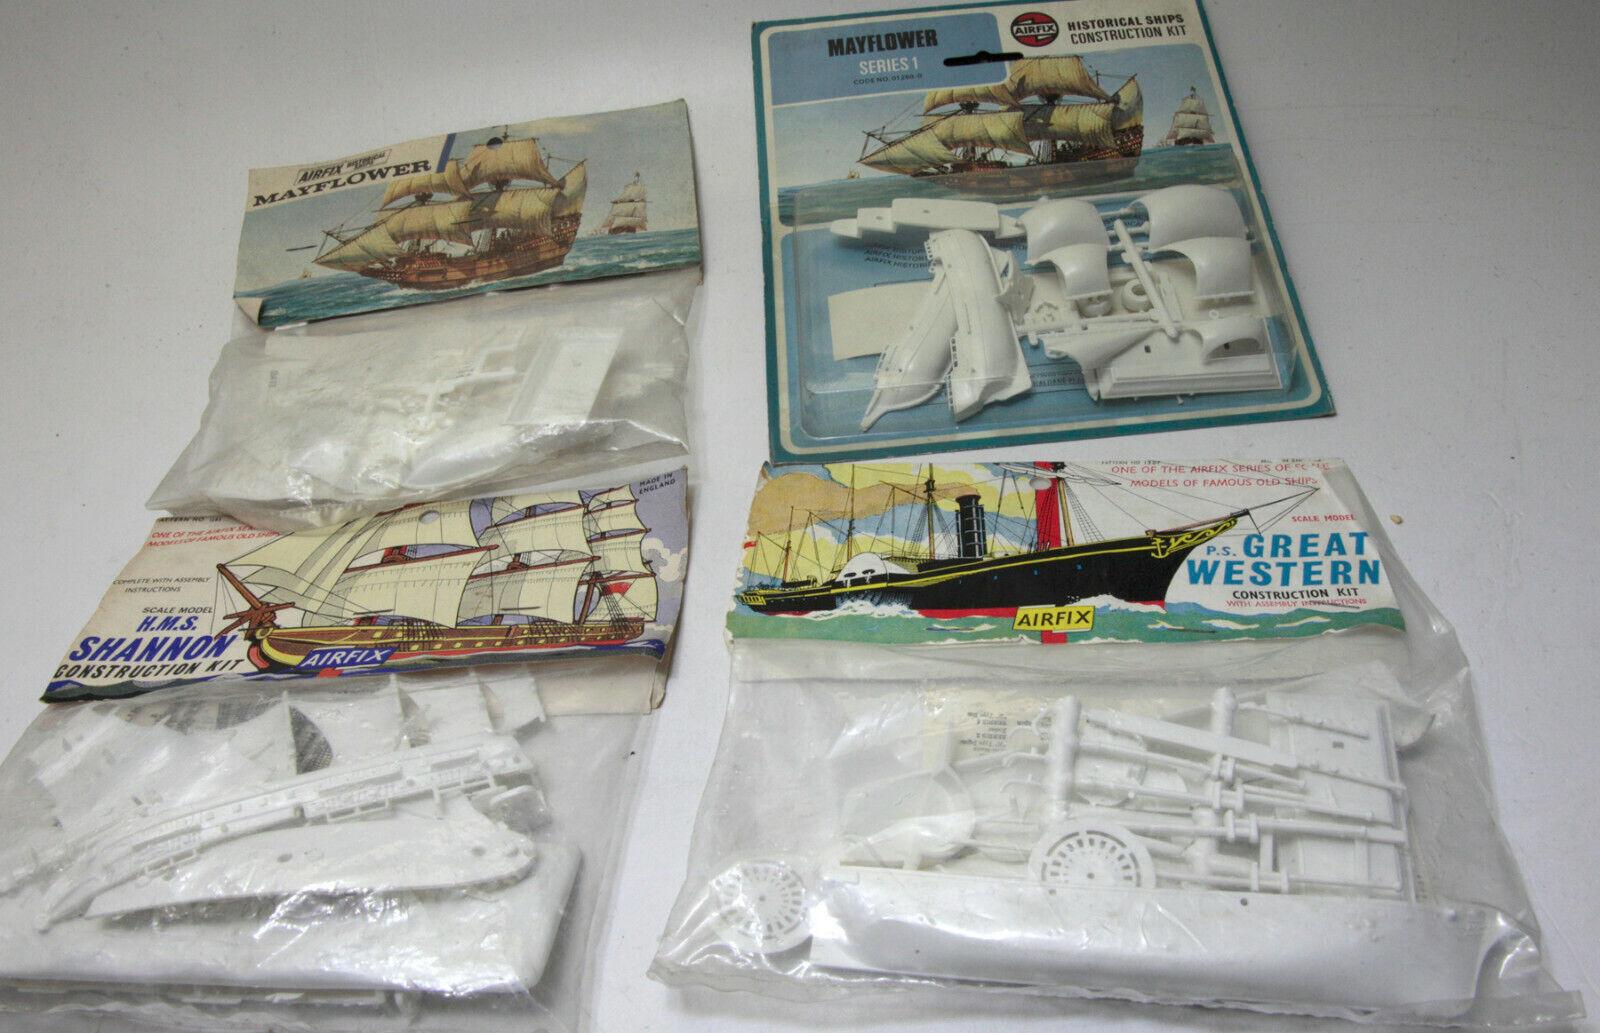 Airfix 4 Navi   Vintage1  Shannon 2  Mayflower 1 Great western RARE anni 60